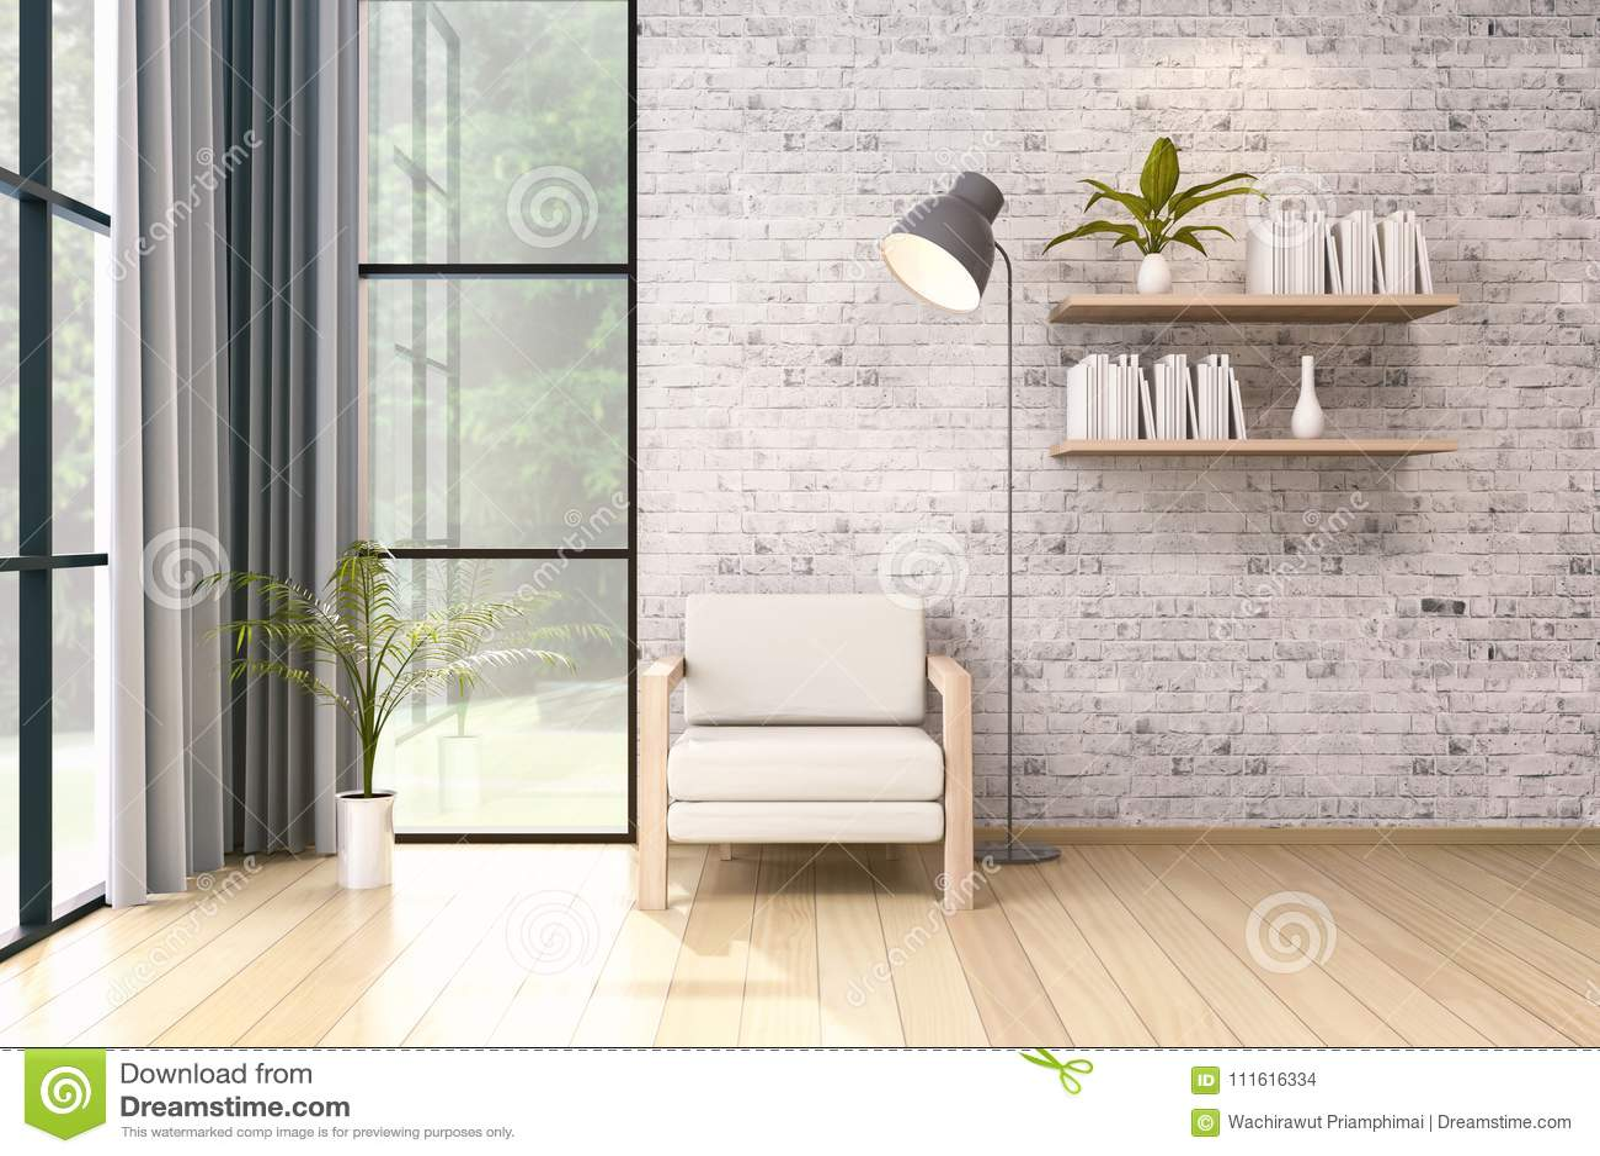 modern loft interior design , white chair and black lamp on brickmodern loft interior , white chair and black lamp on brick wall, 3d render